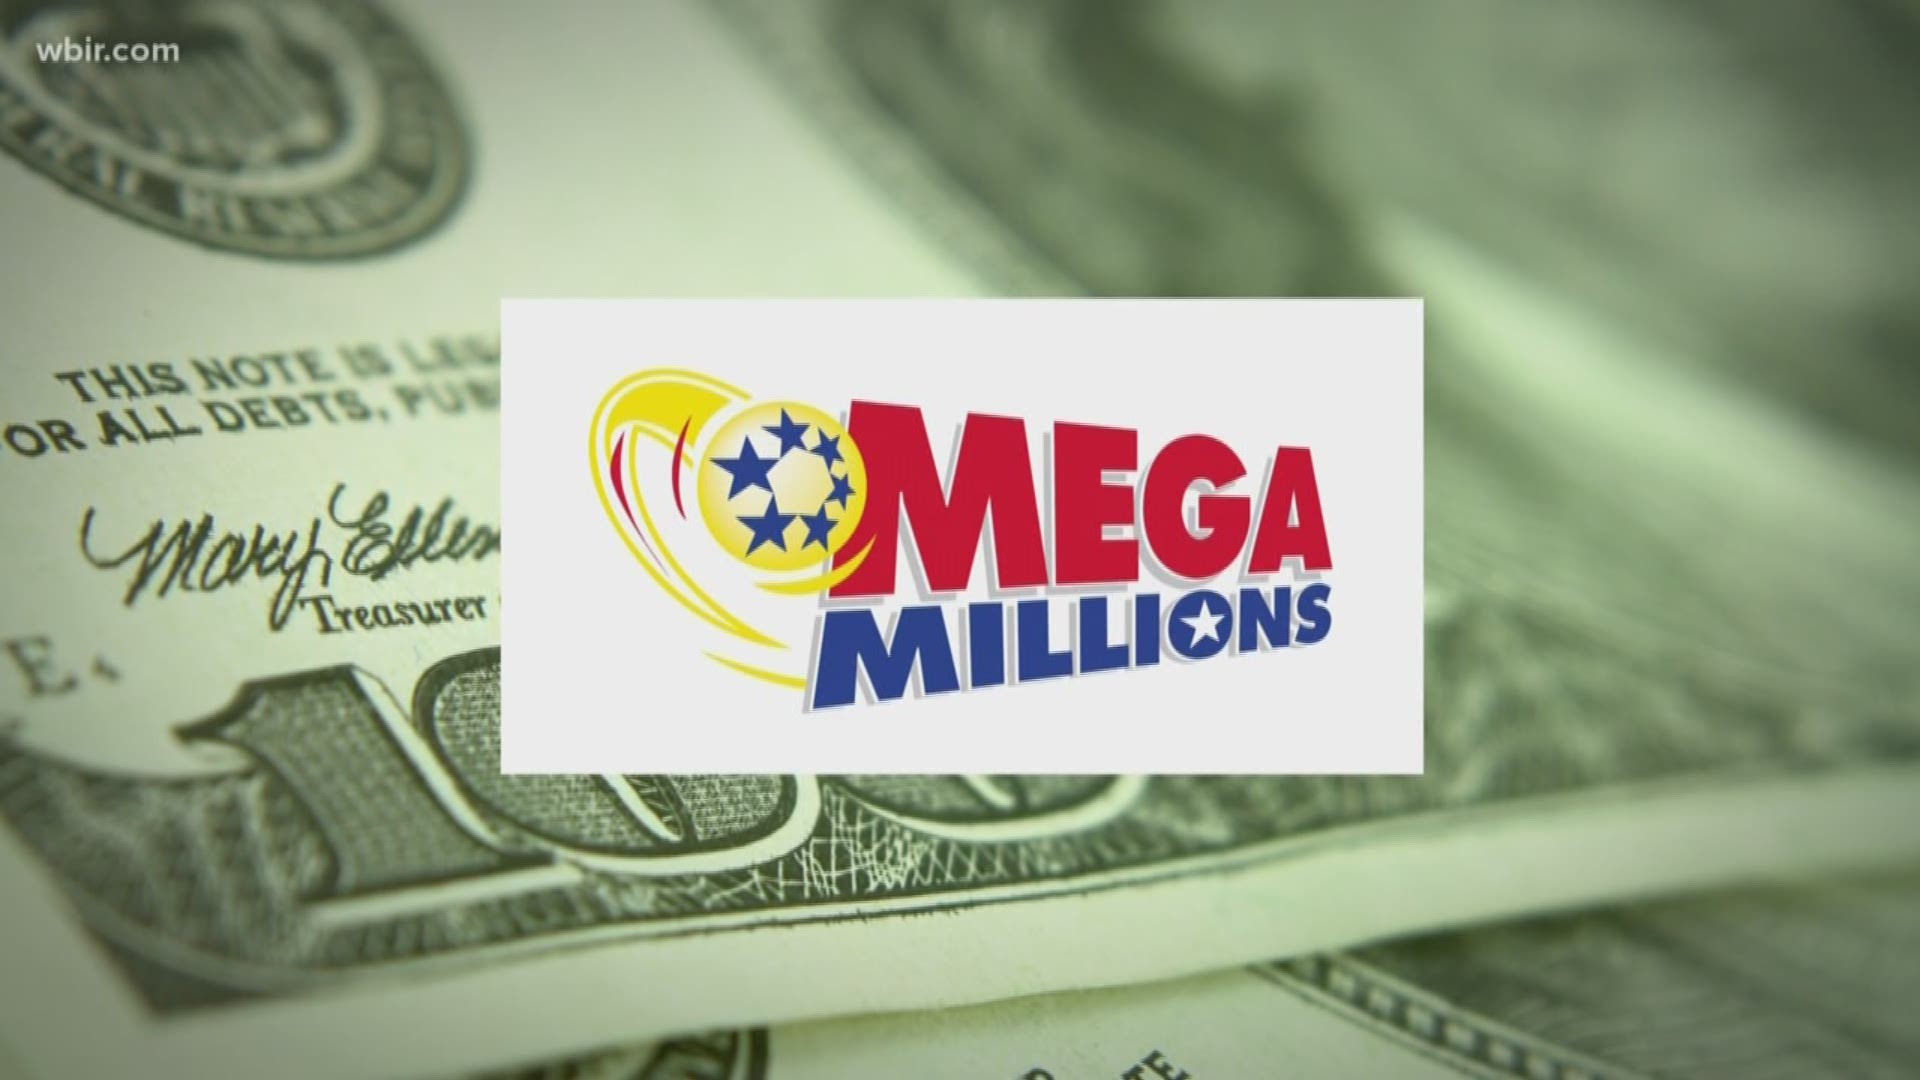 Next Mega Millions drawing is tonight | wbir.com